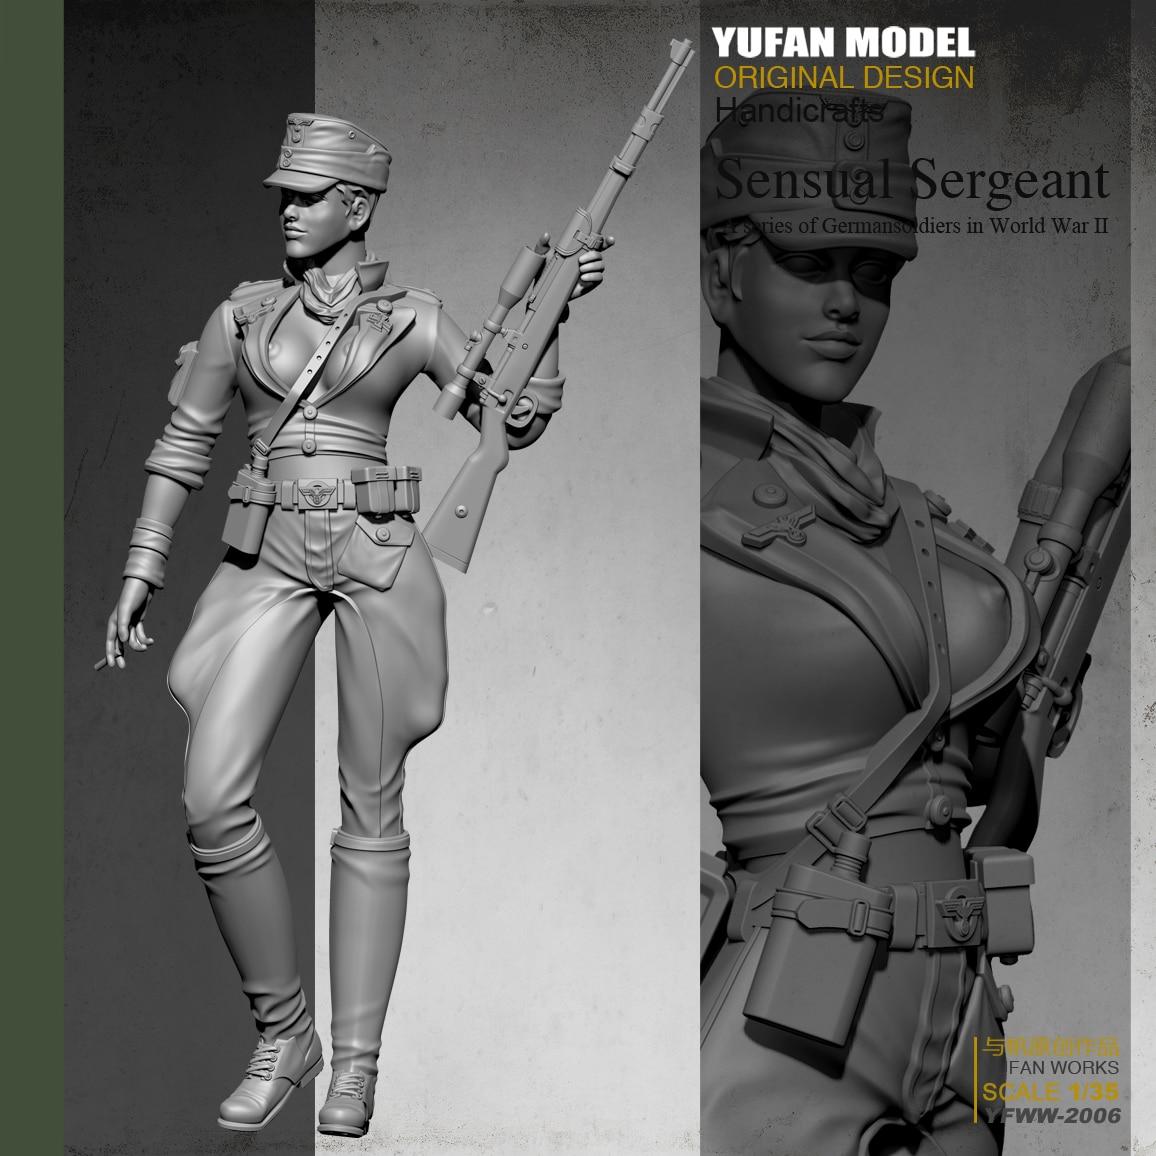 Yufan Modelo 1/35 do Sexo Feminino Sniper Soldado Resina Incolor E Self-assembled Yfww-2006